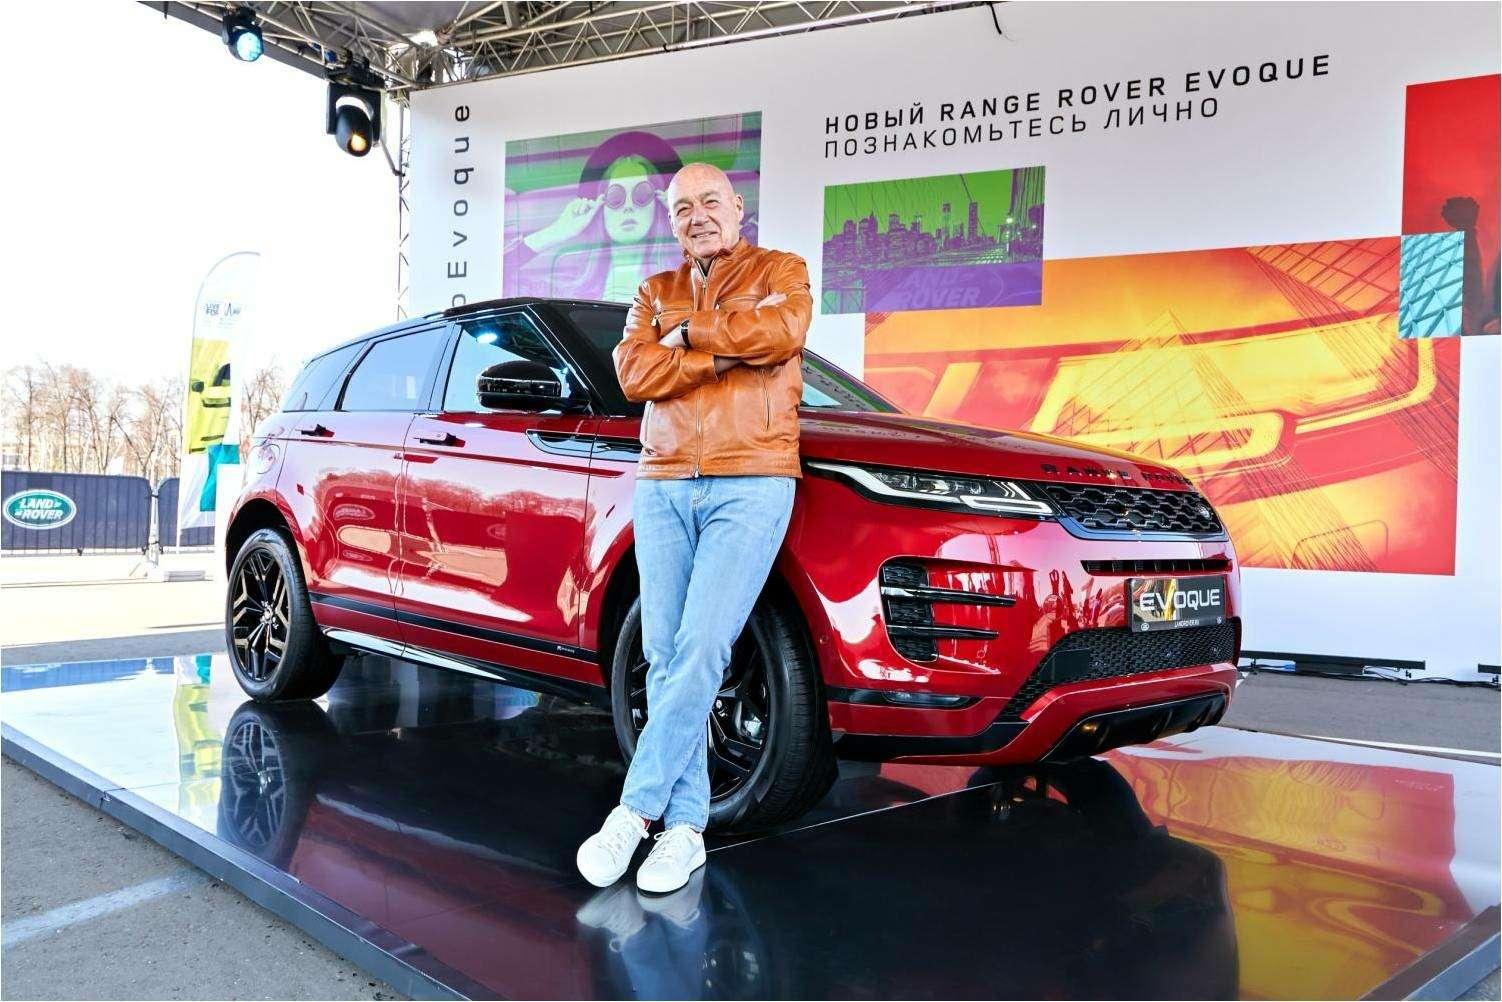 Новый Range Rover Evoque представили вокружении звезд— фото 968825